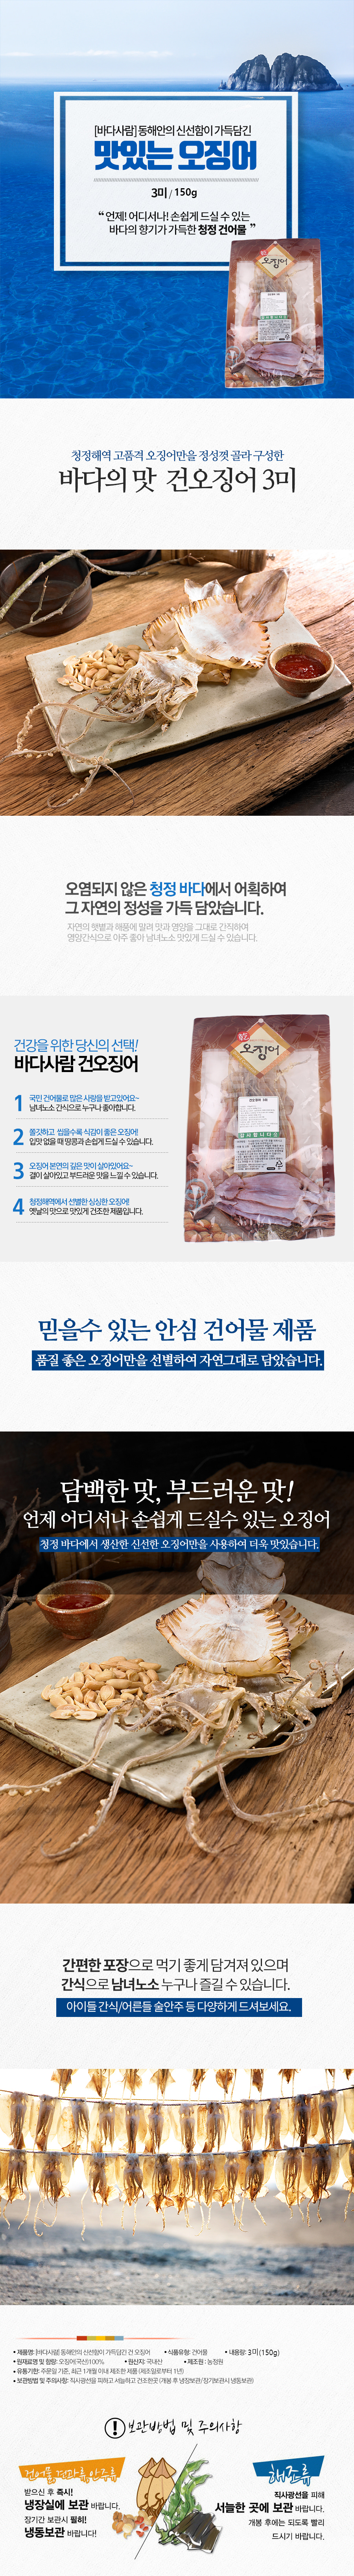 donghyen_page_ojingoe_170g.jpg